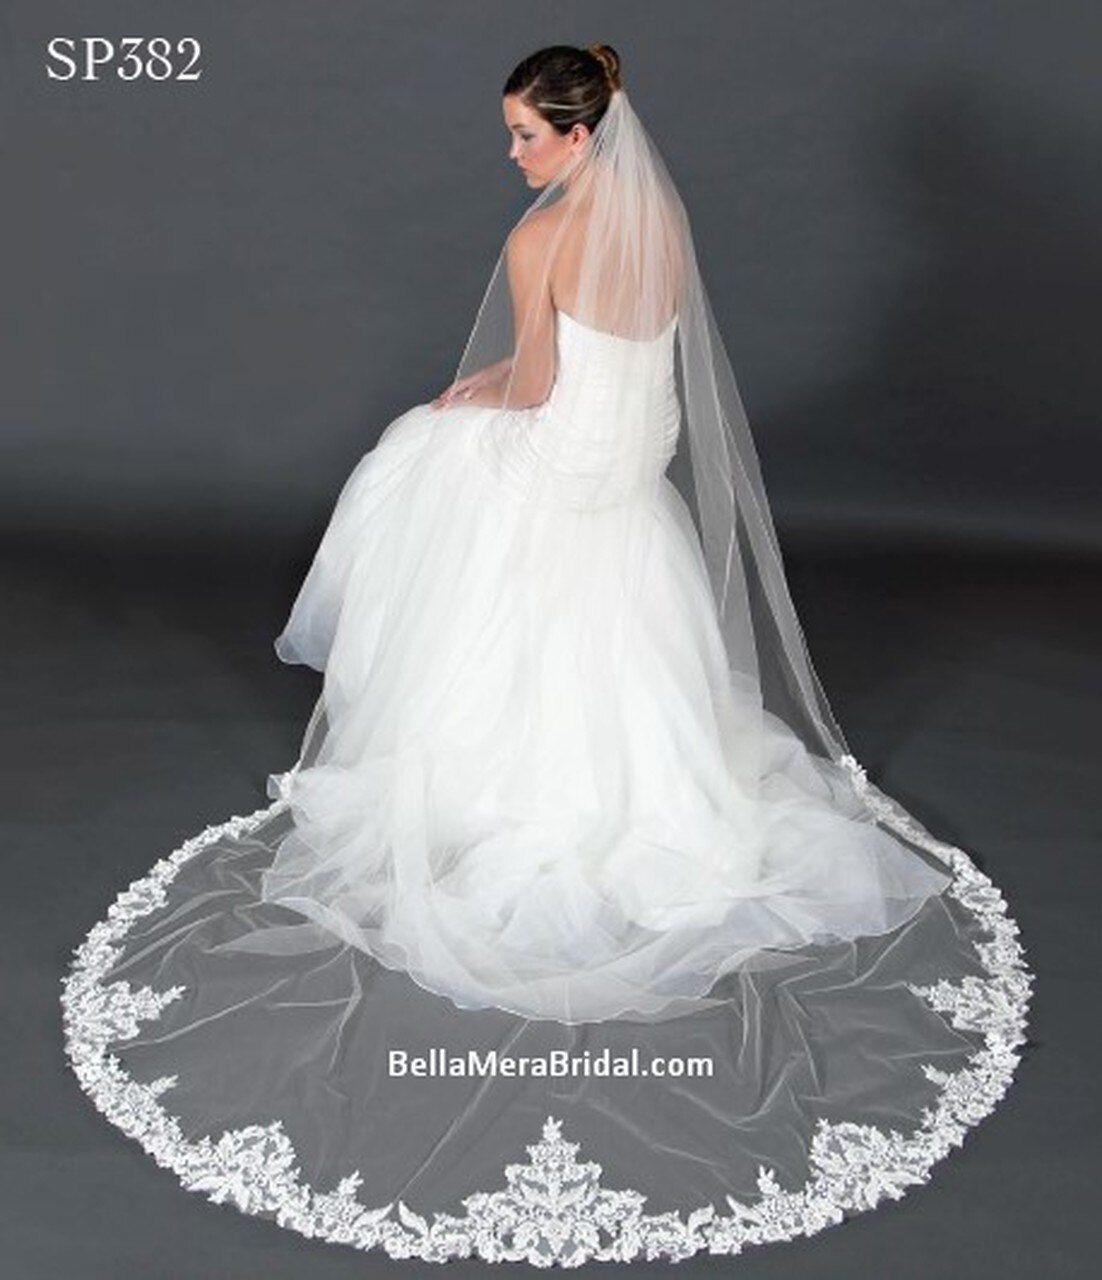 Giselle Bridal Veil Style Sp382 Sequins Beaded Floral Lace 108 Long Veil Styles Floral Lace Sequin Beading [ 1280 x 1102 Pixel ]